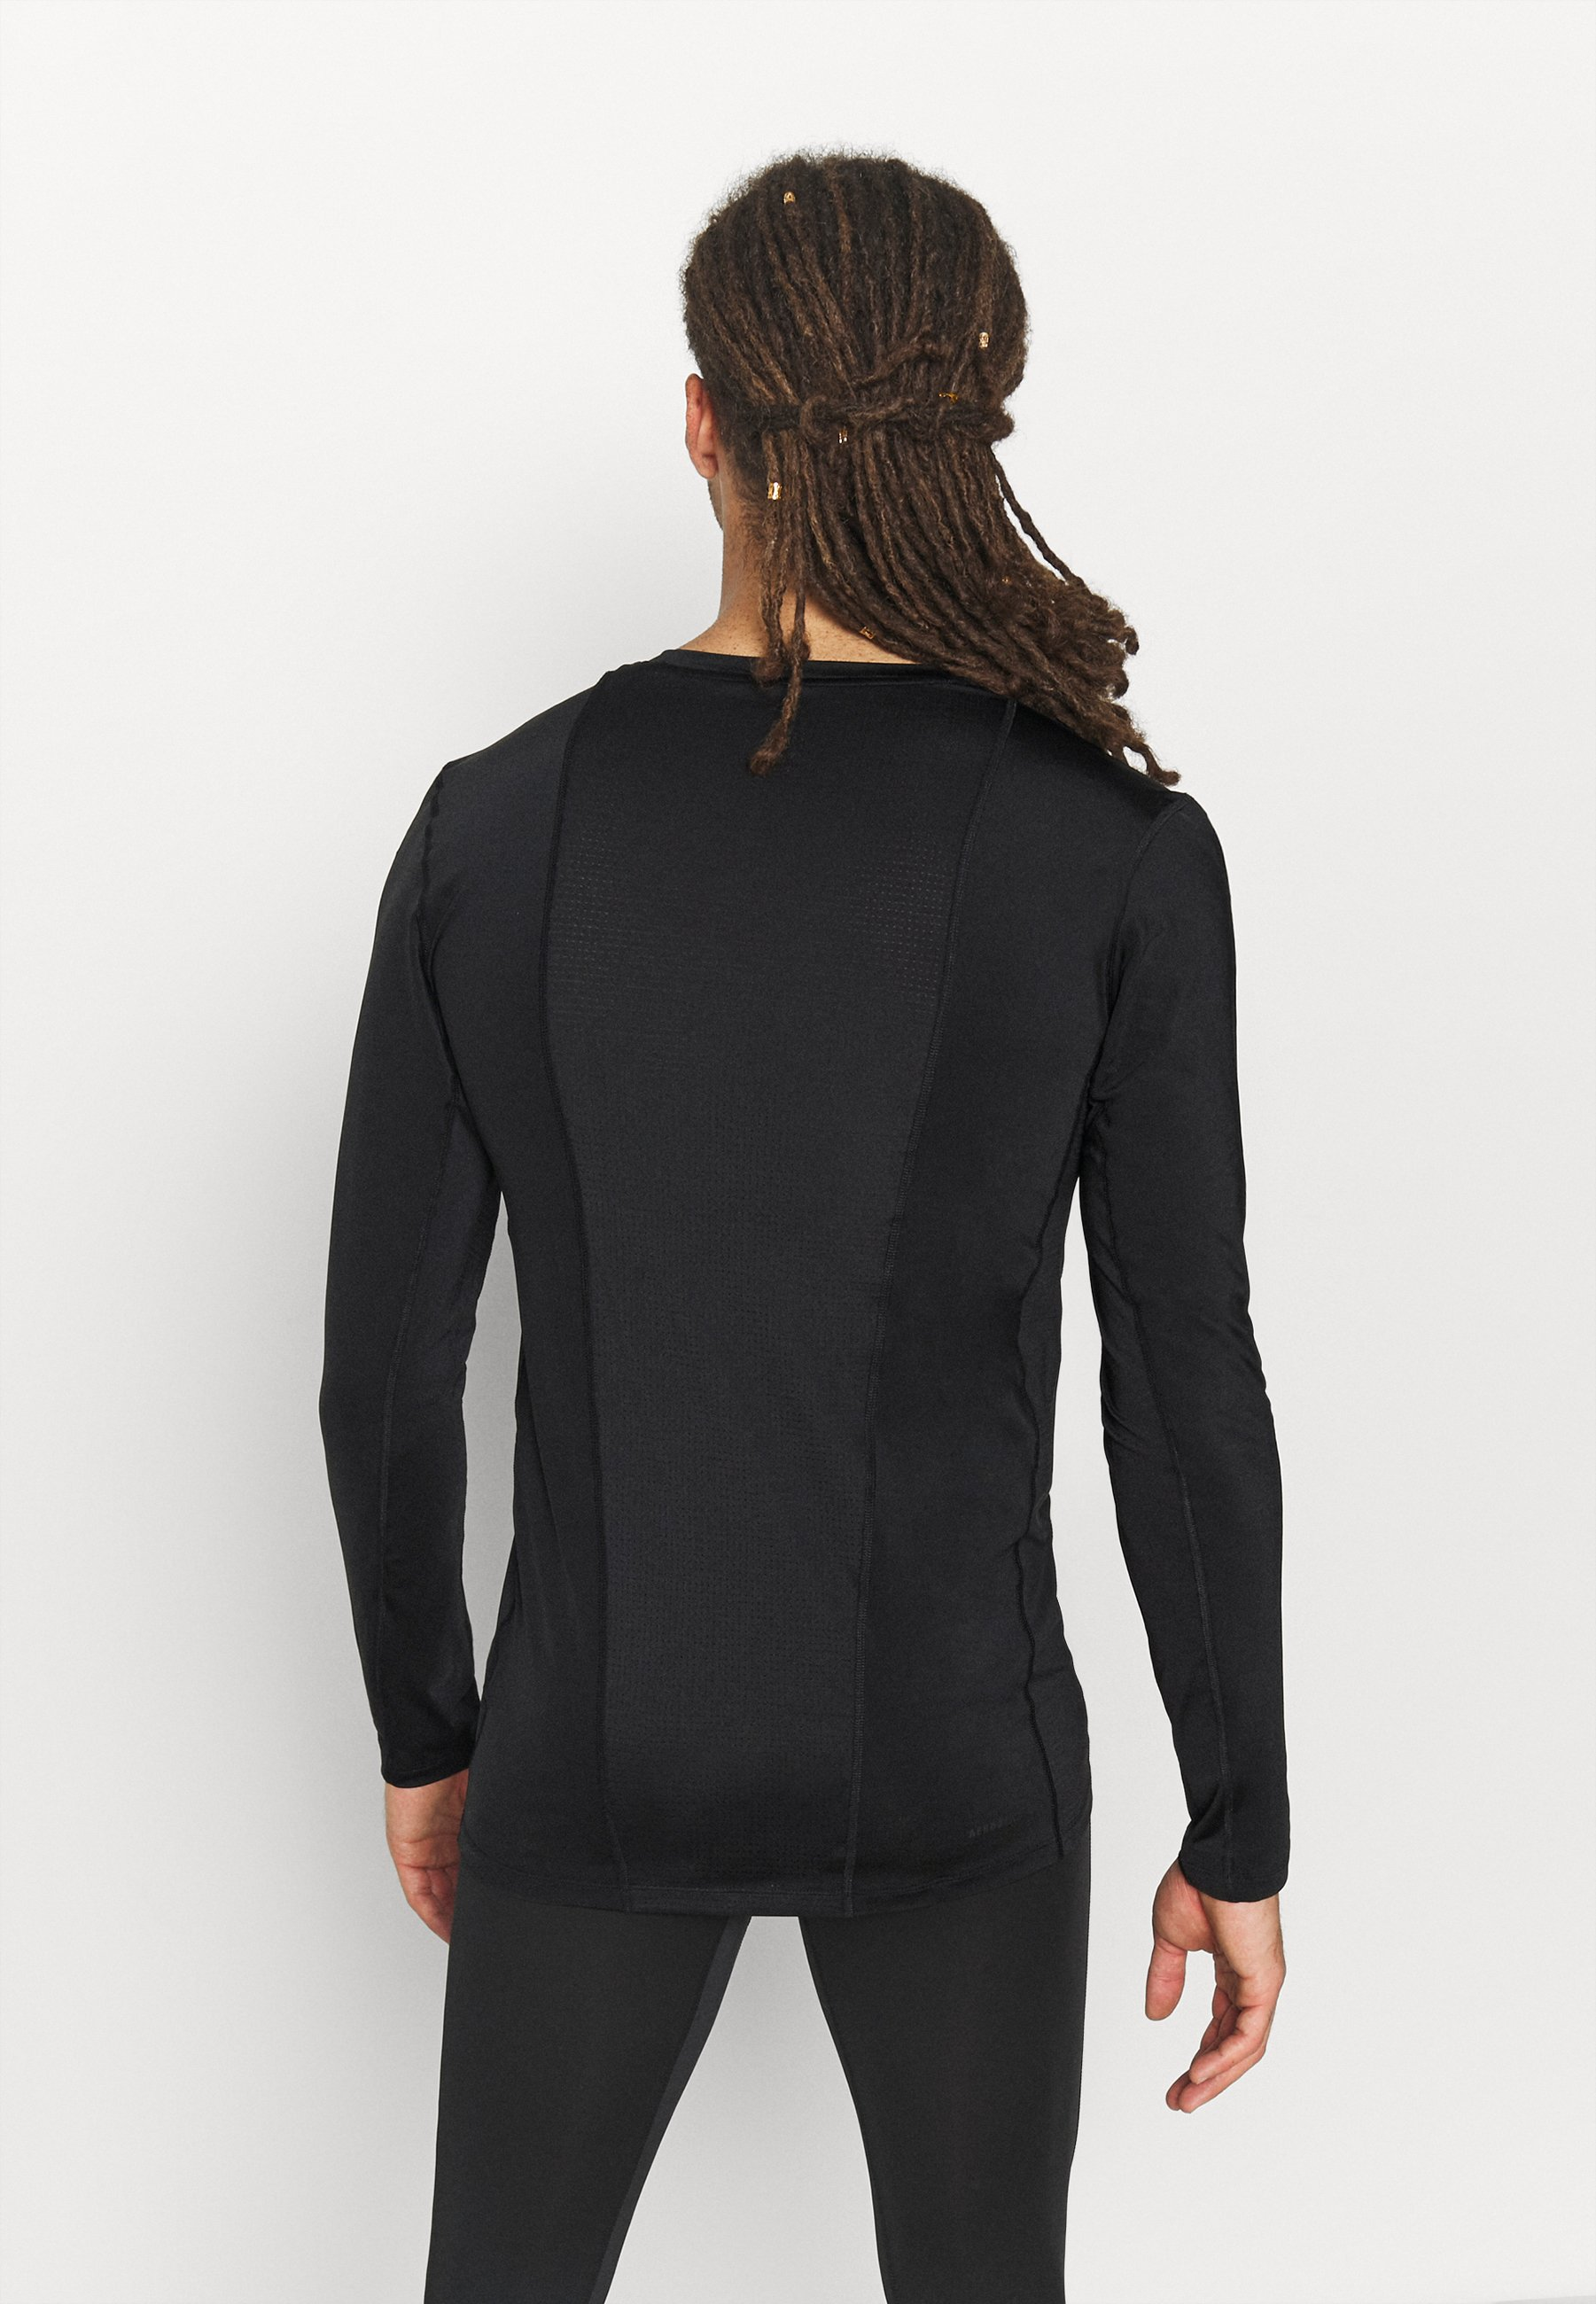 Uomo PRIMEGREEN COMPRESSION LONG SLEEVE T-SHIRT - Maglietta a manica lunga